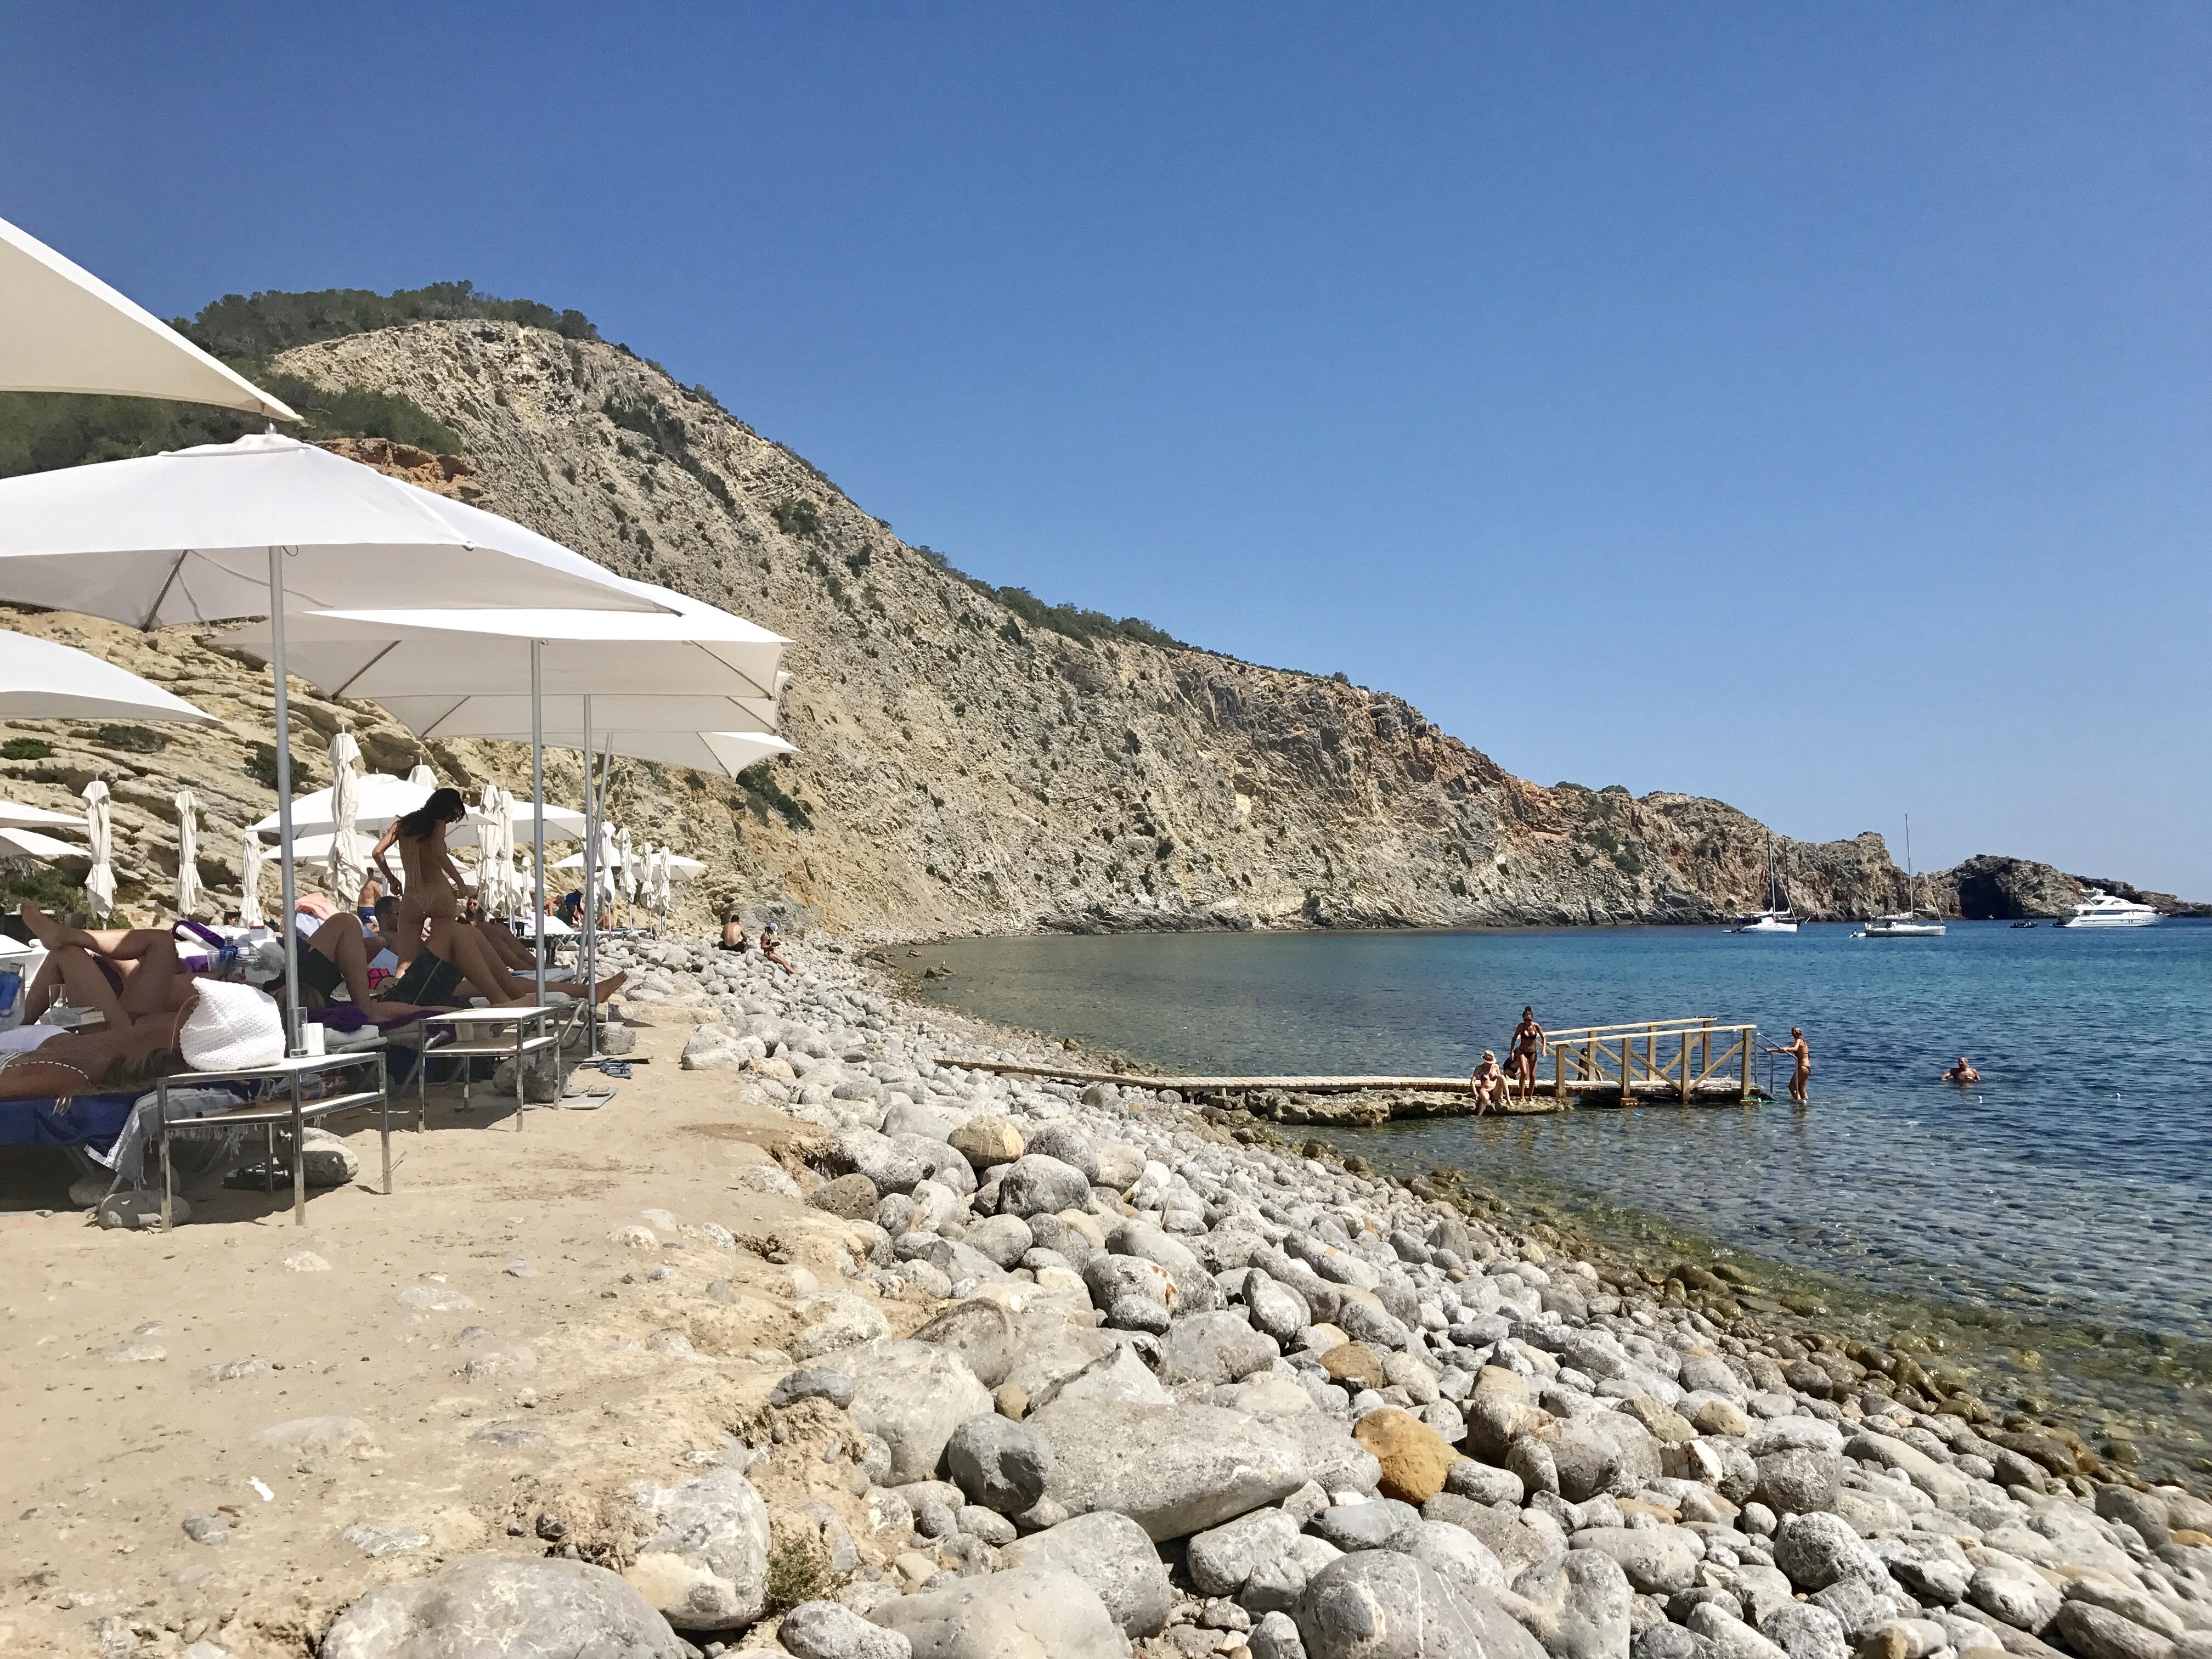 Camille et les garçons SIMBA in Ibiza 1